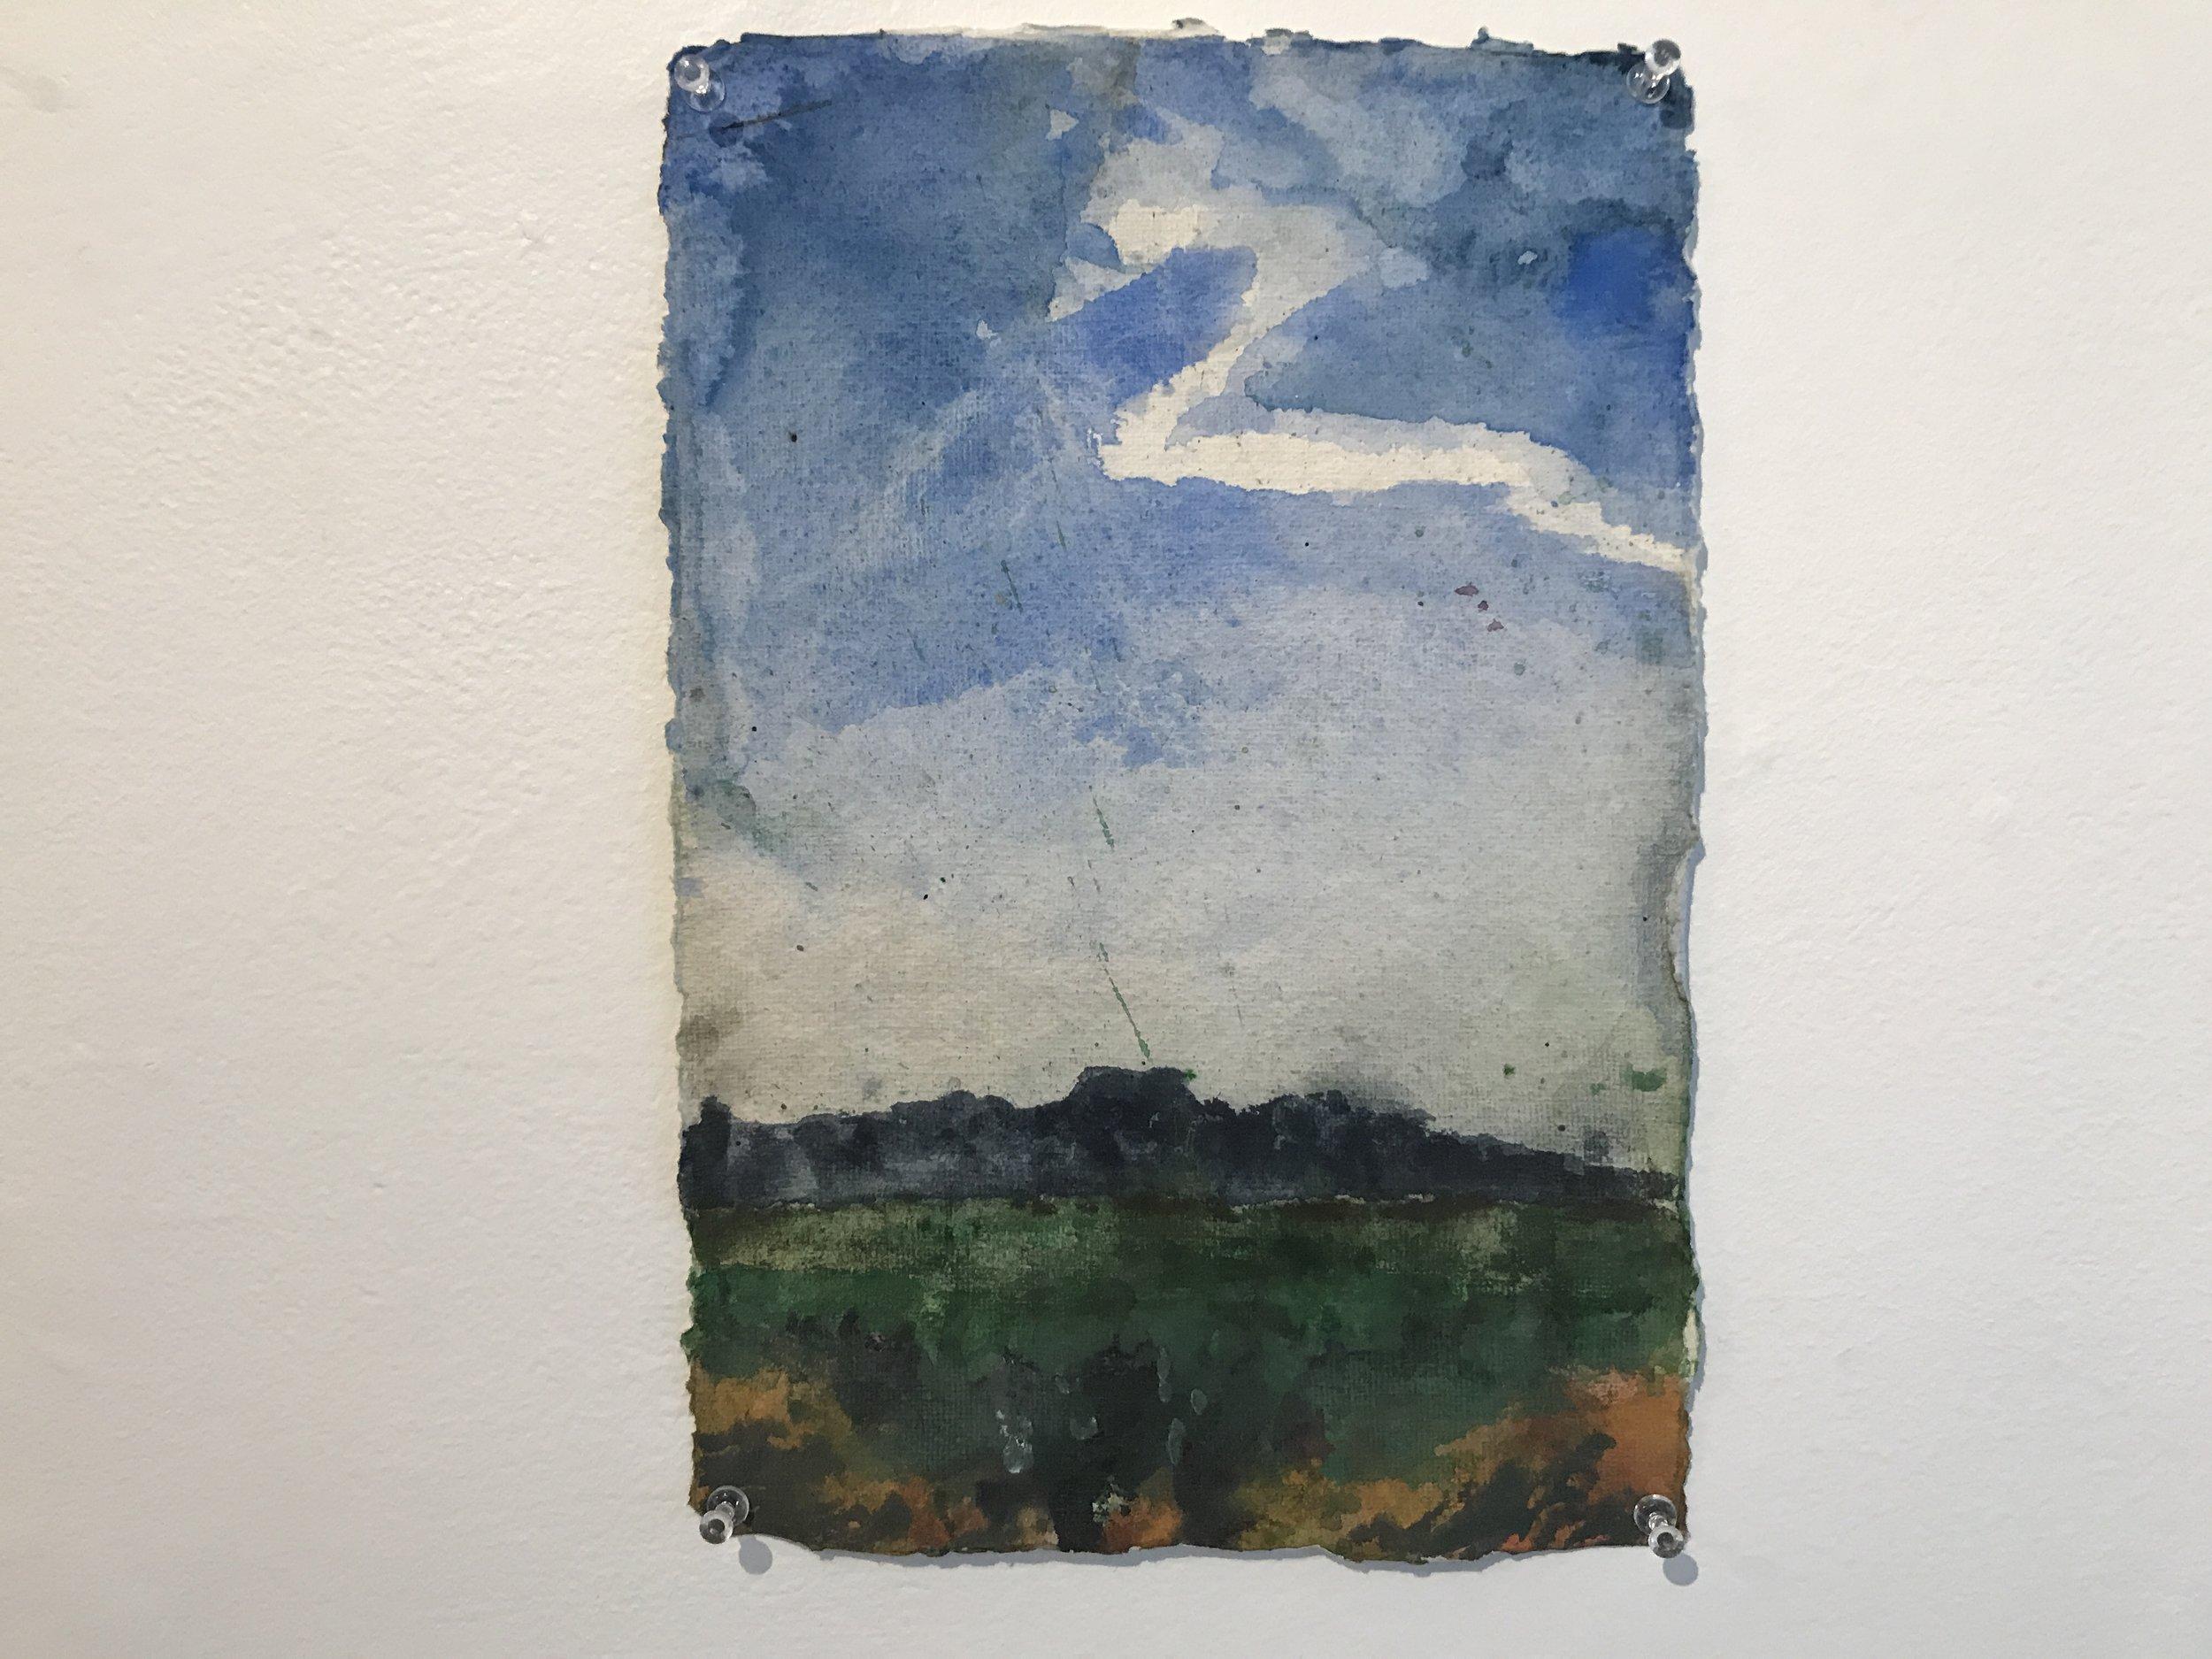 Z cloud | 2014 | watercolor on khadi paper | 12 1⁄2 x 8 1⁄2 in.